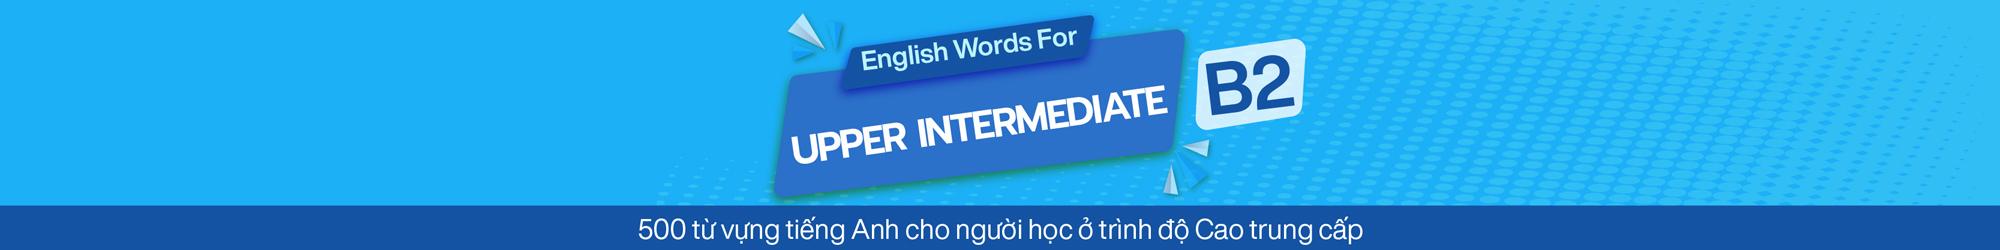 English Words For Upper Intermediate (B2)